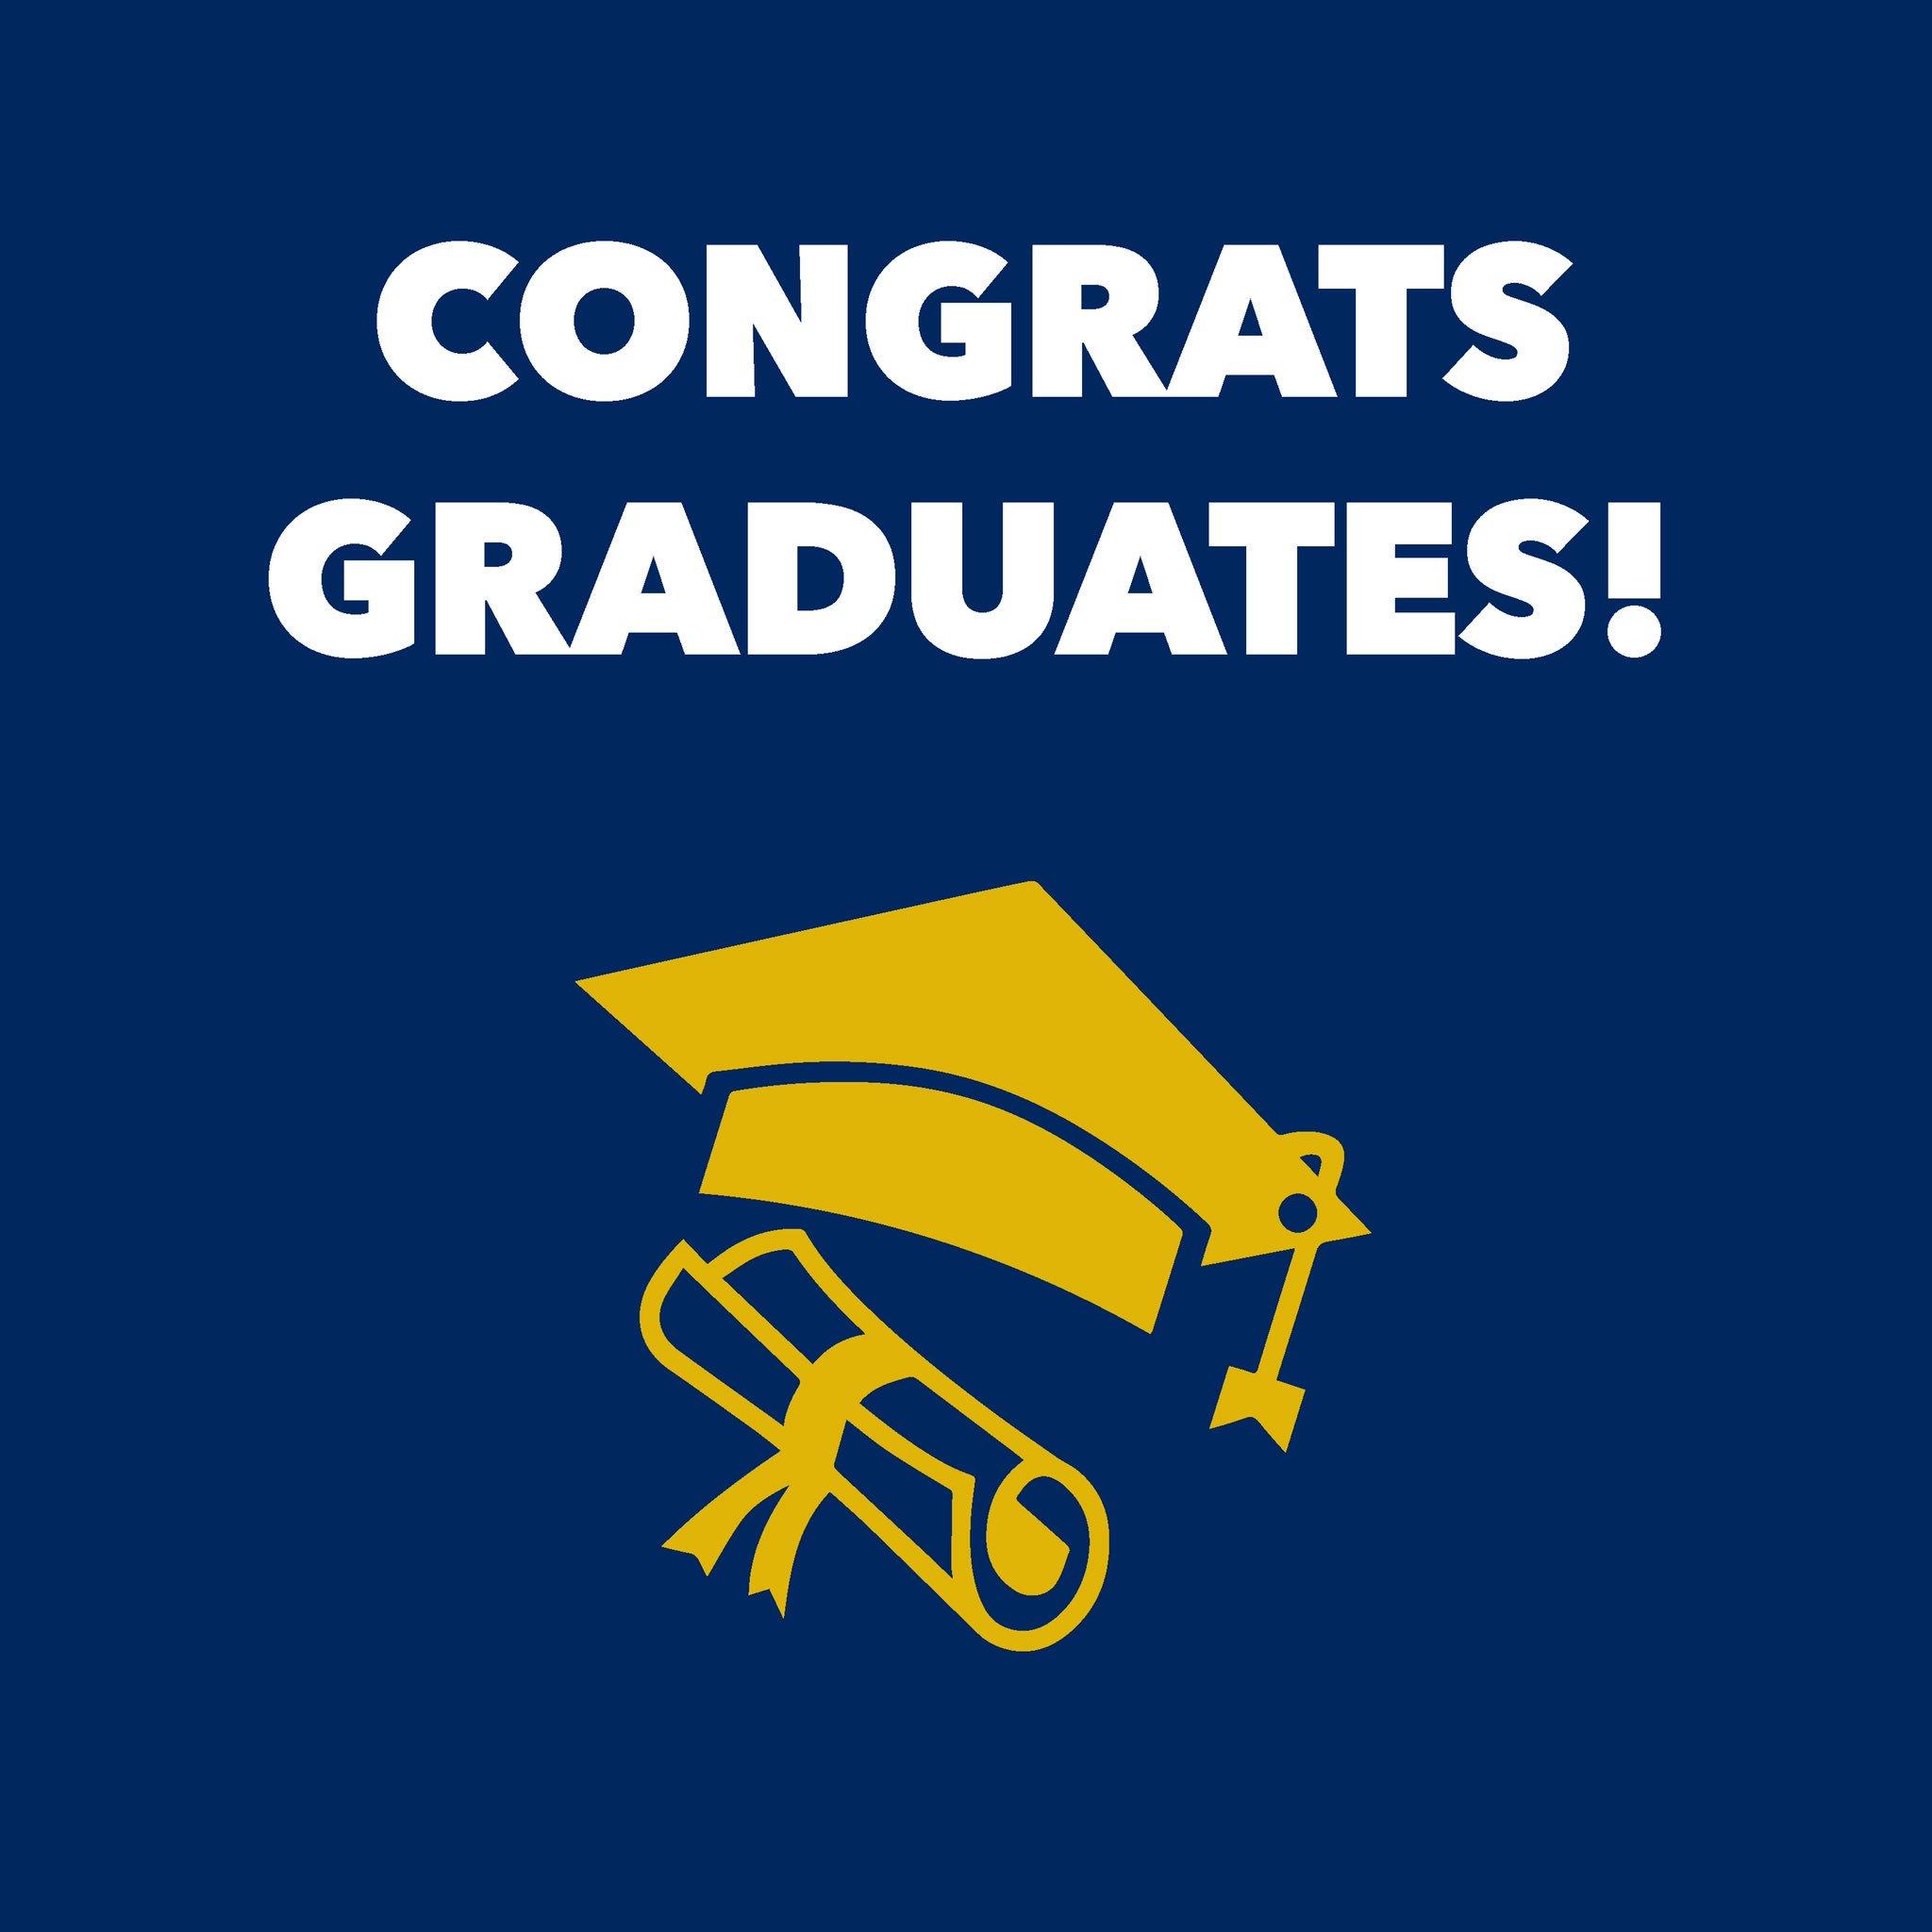 Congratulations class of 2017!!! 😊 #UAkronCareer #foreverazip https://t.co/yIisrK43SJ